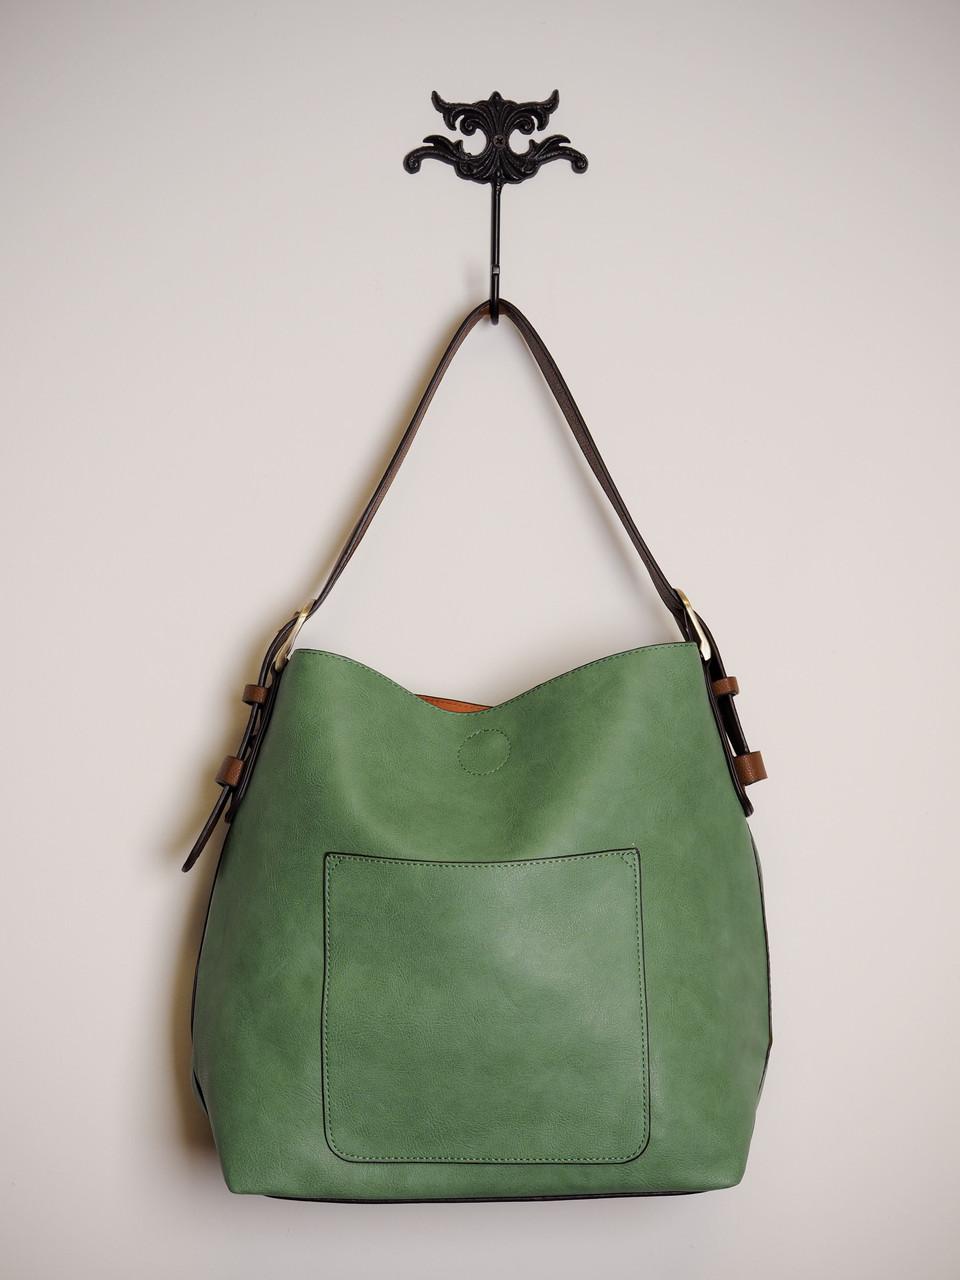 Classic Hobo Handbag